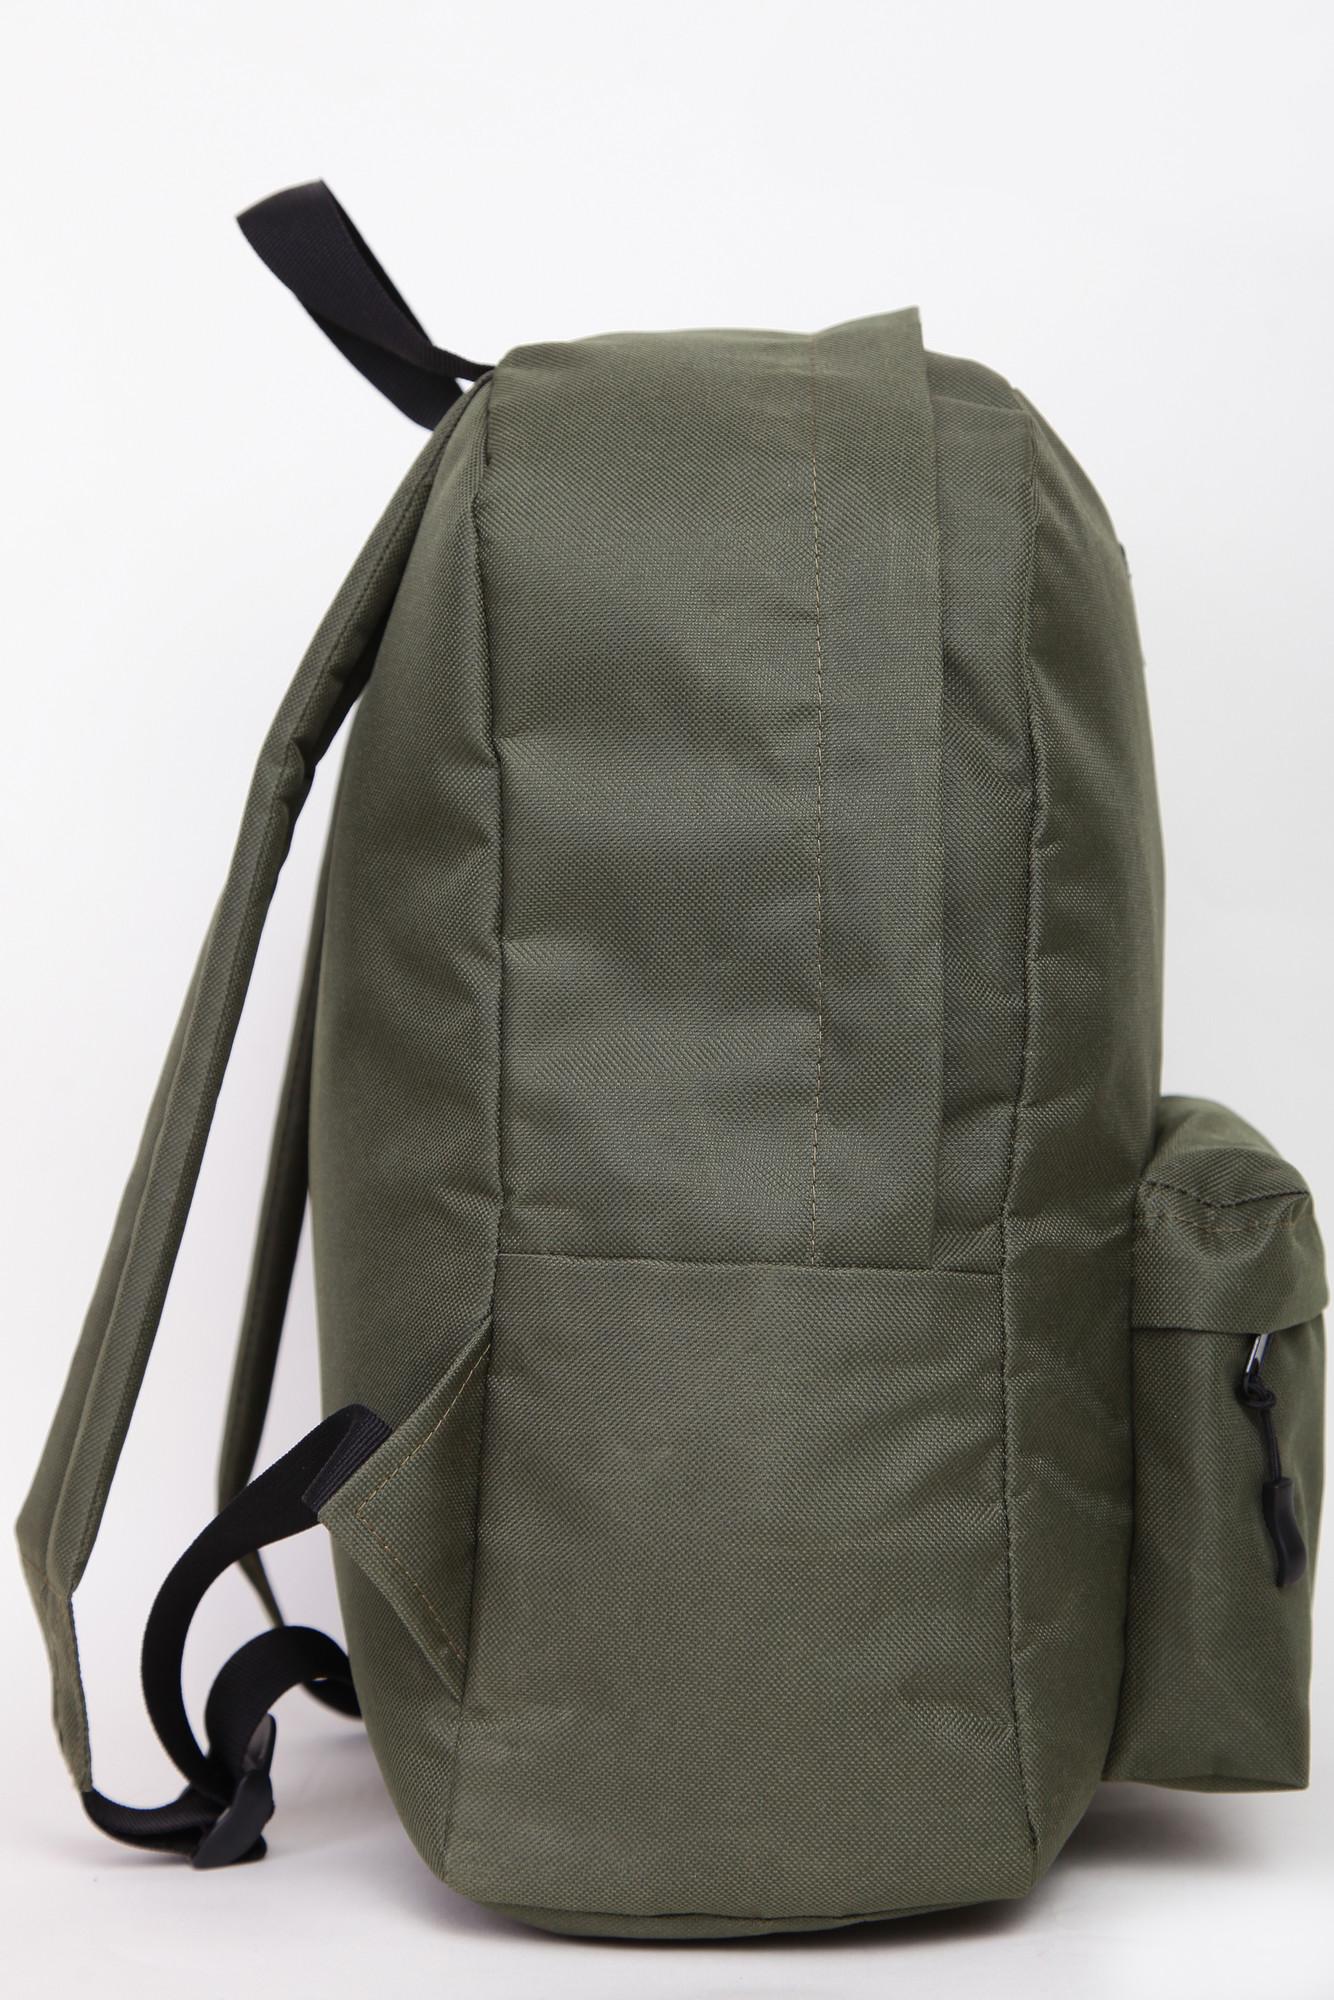 54d30ae52685 Рюкзак AIR PACK Small Оливковый, заказать, цена с фото дешево в интернет  магазине в Москве